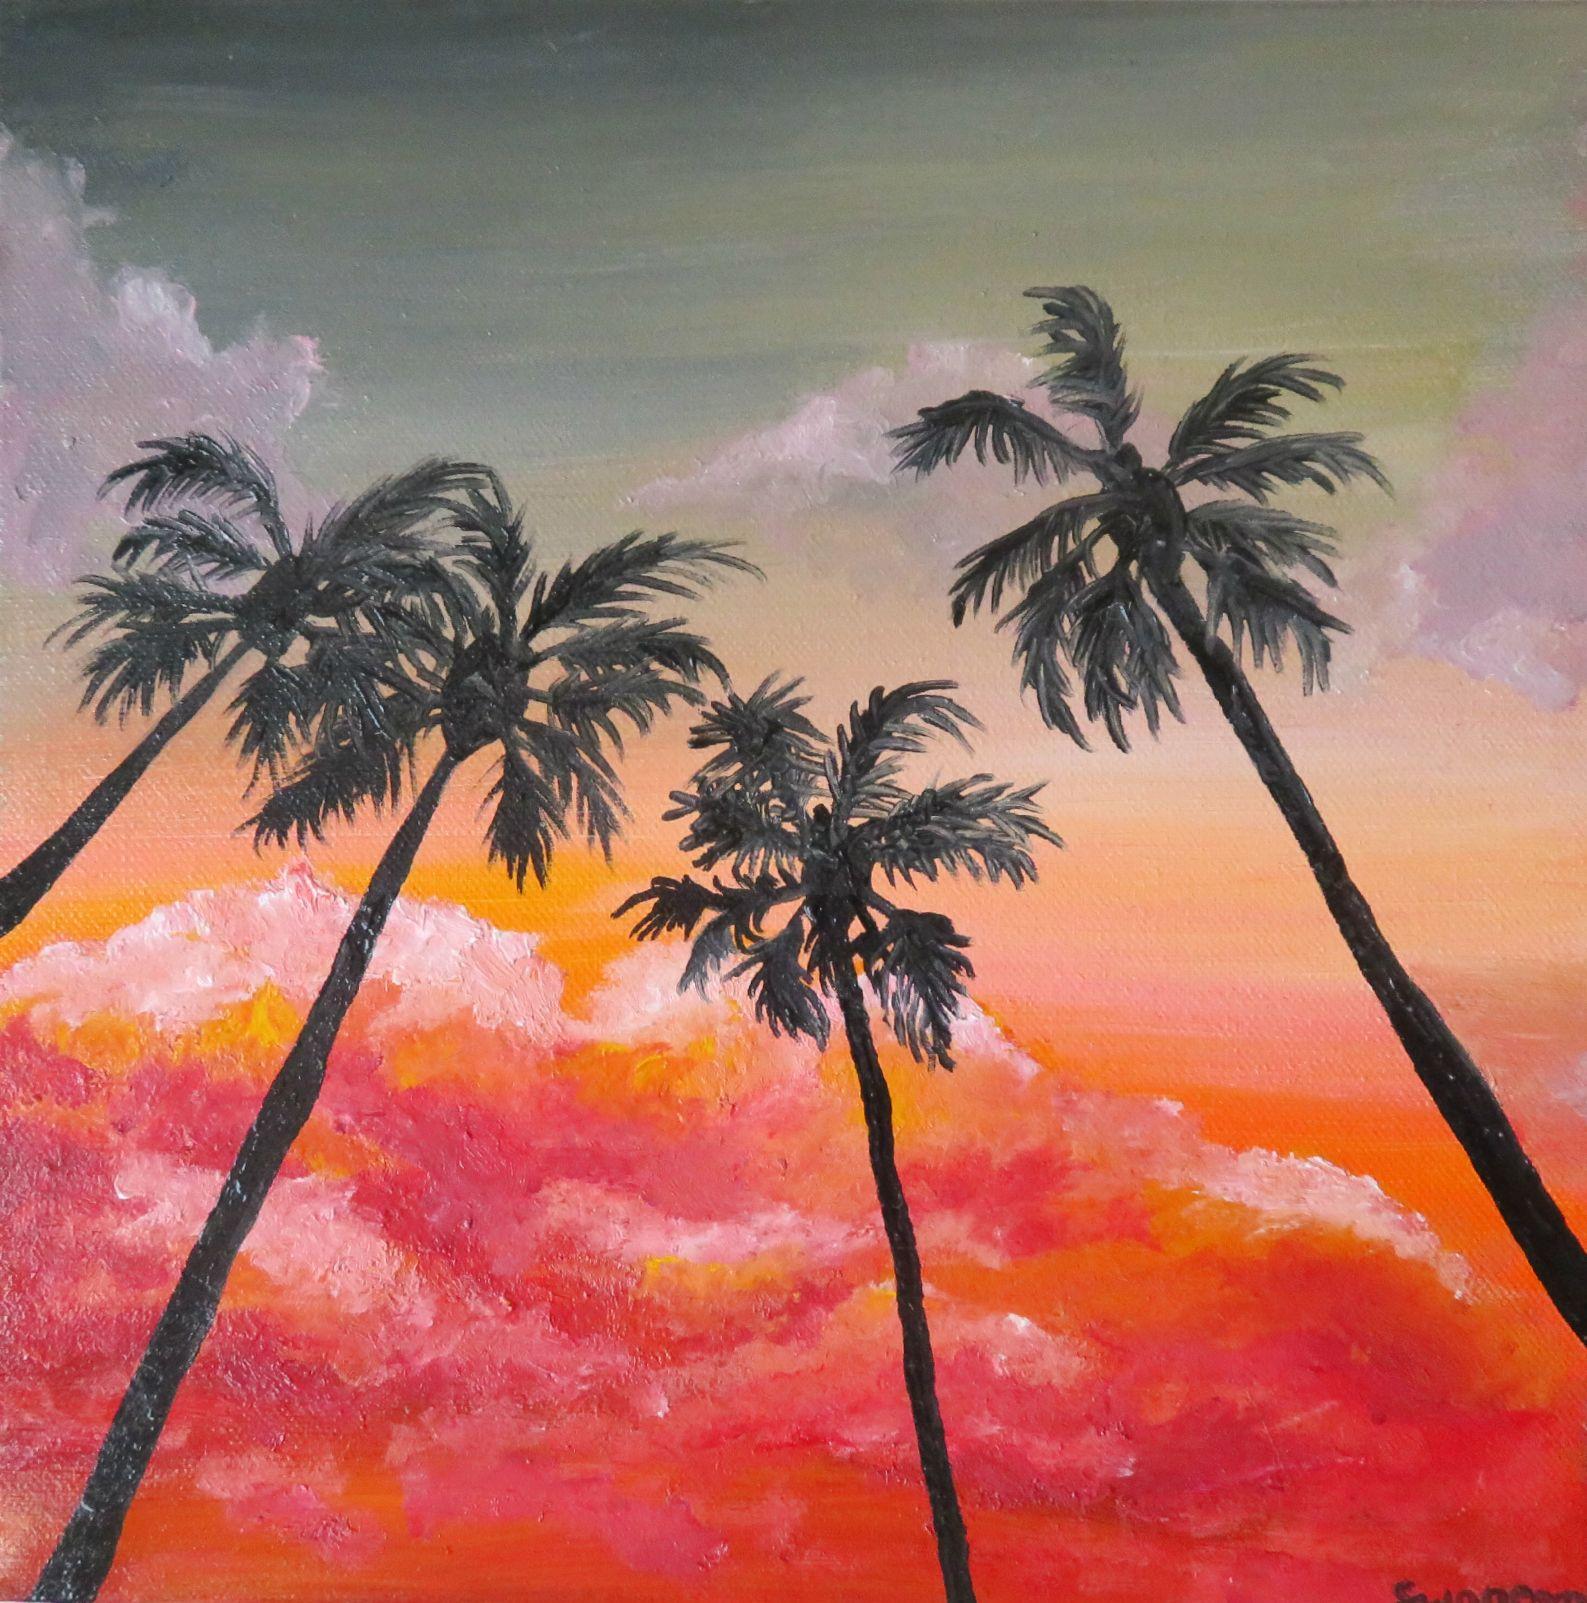 Palm Tree Painting Palm Tree Sunset Wall Art Original Palm Tree Artwork Tropical Home Decor Acrylic Beach Painting Sunset Art 10x10 In 2020 Palm Trees Painting Sunset Wall Art Palm Tree Artwork